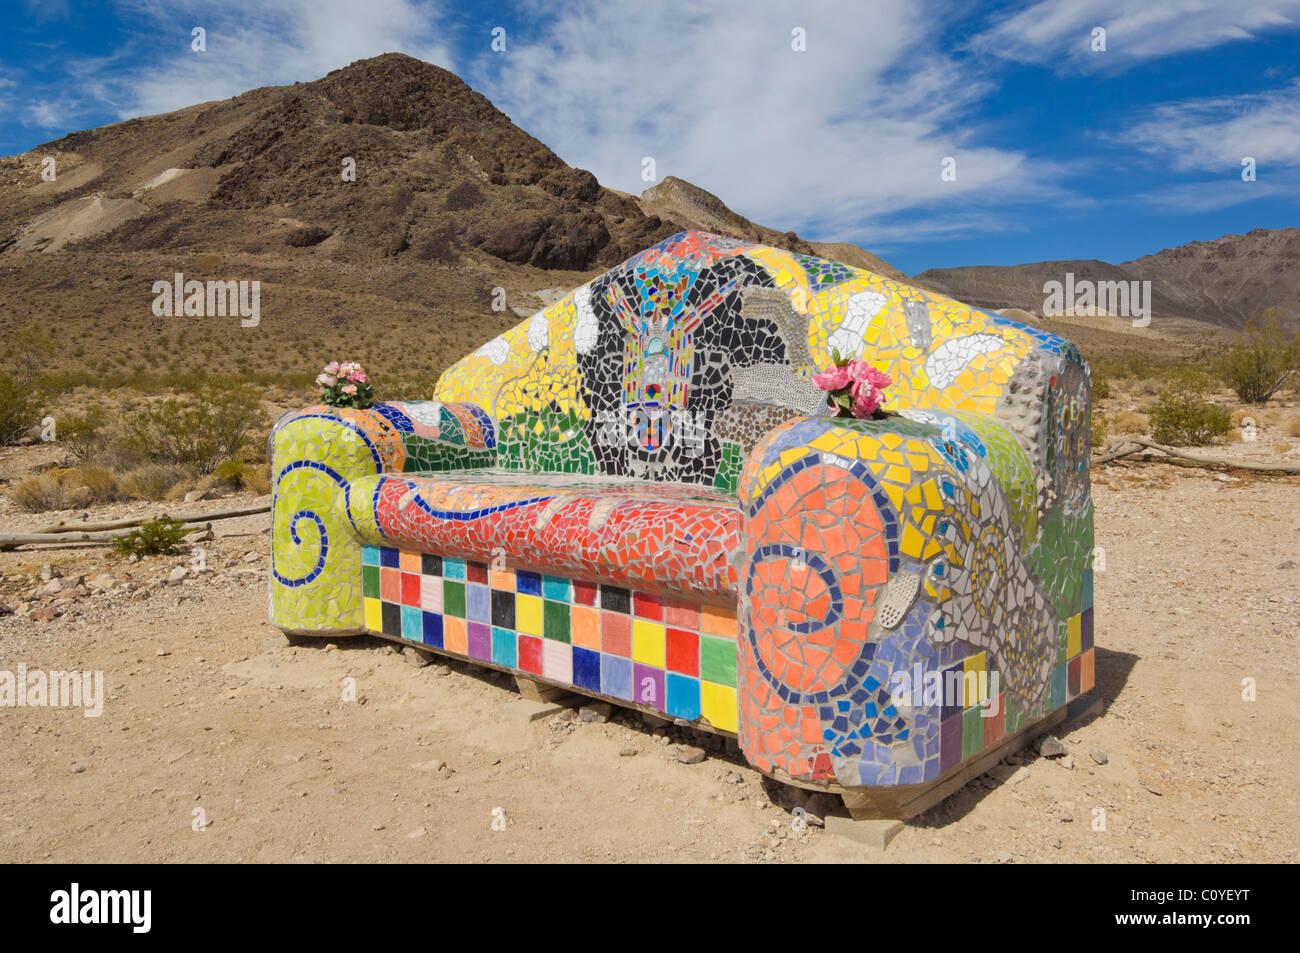 mosaic sofa at the Goldwell Open air museum Rhyolite near Beatty nevada USA - Stock Image